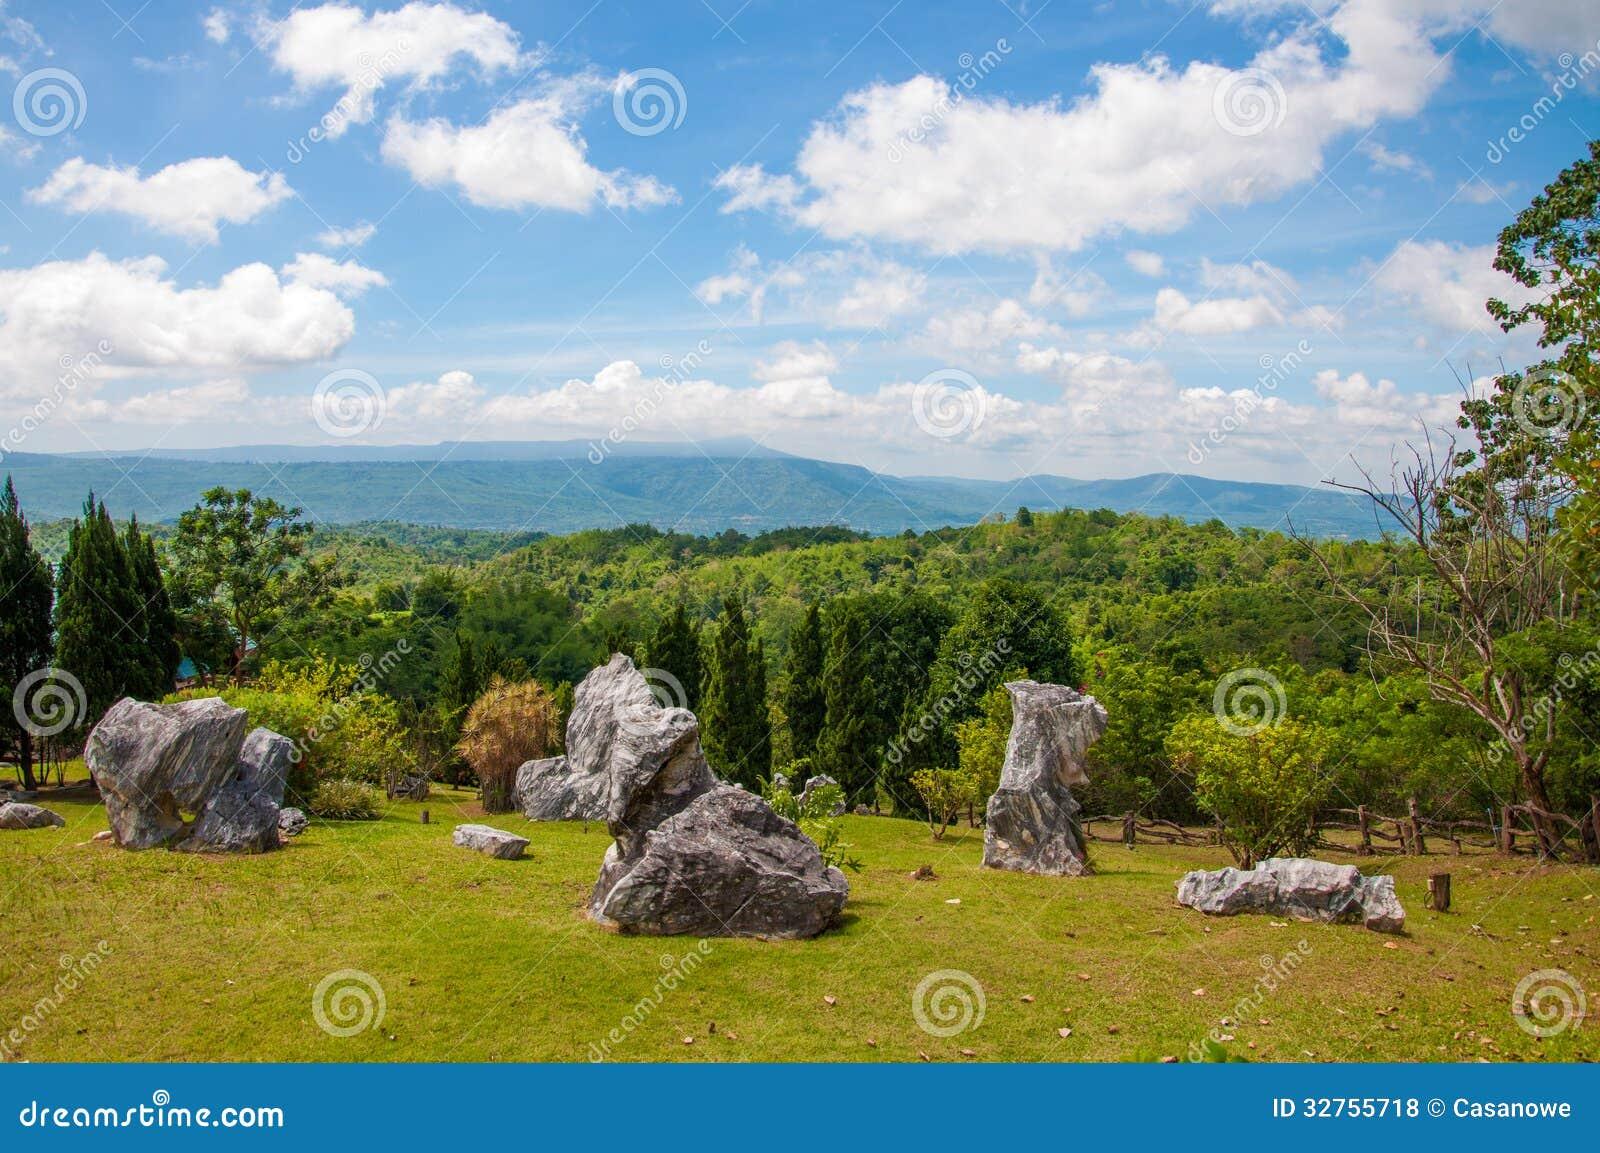 fotos de jardim grande:Bonito De Pedra Grande No Jardim Fotos de Stock Royalty Free – Imagem